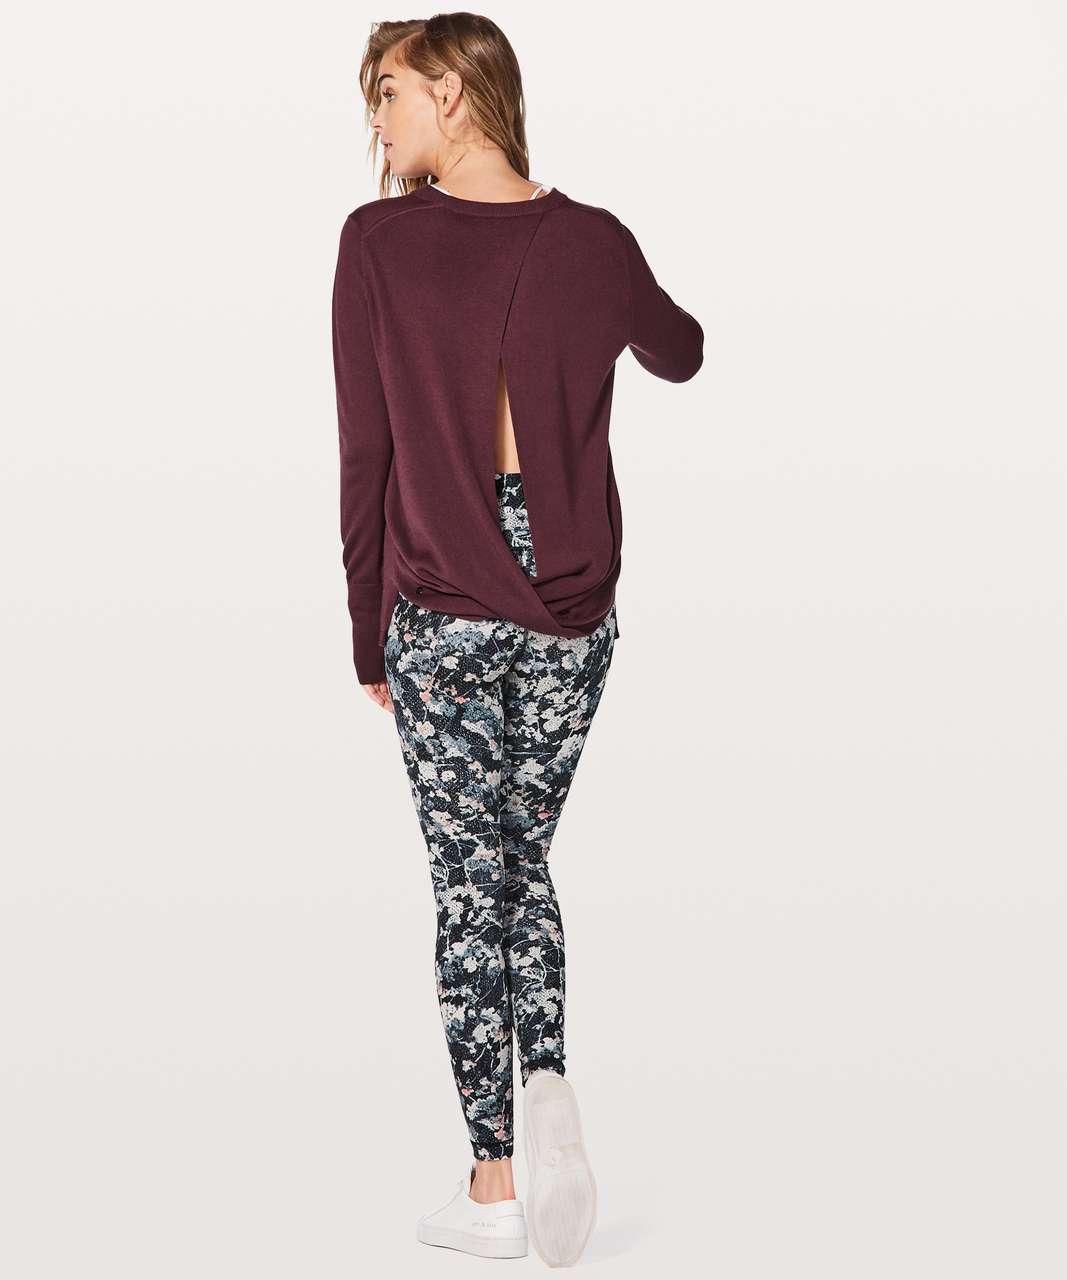 Lululemon Bring It Backbend Sweater - Redwood